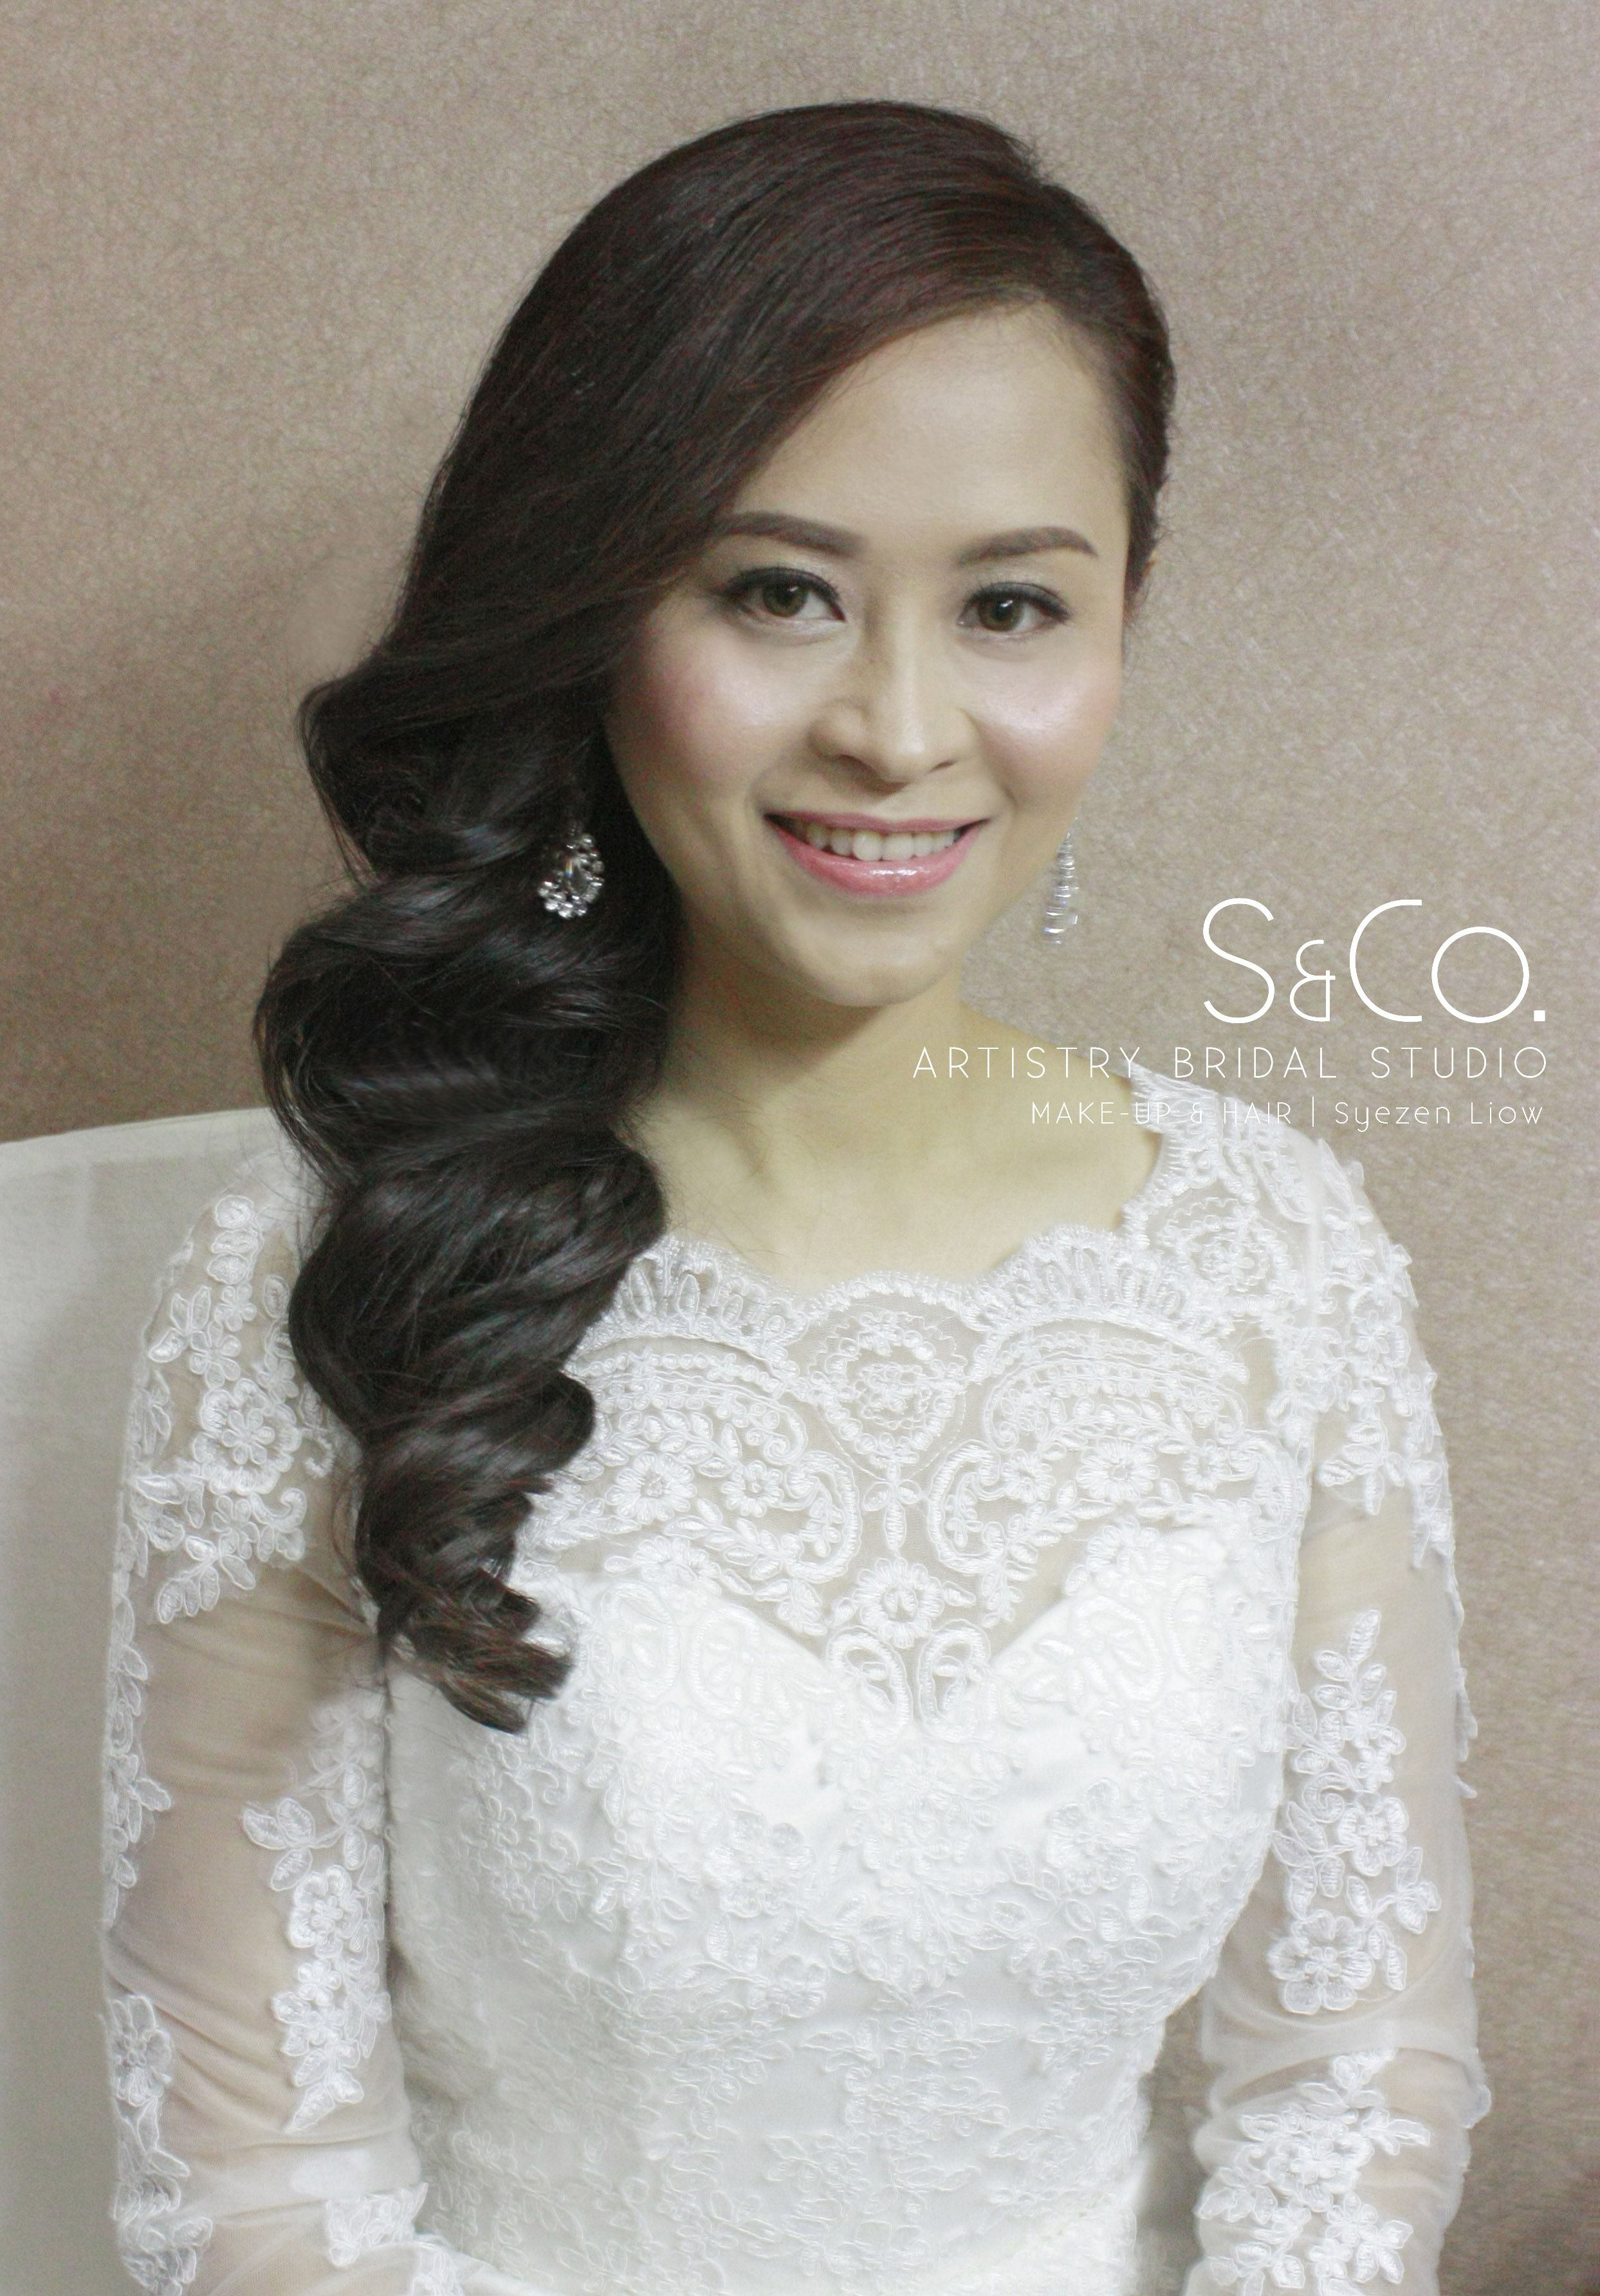 Bridal Hair Waving Hairstyle | S & Co. Real Bride | Pinterest ...